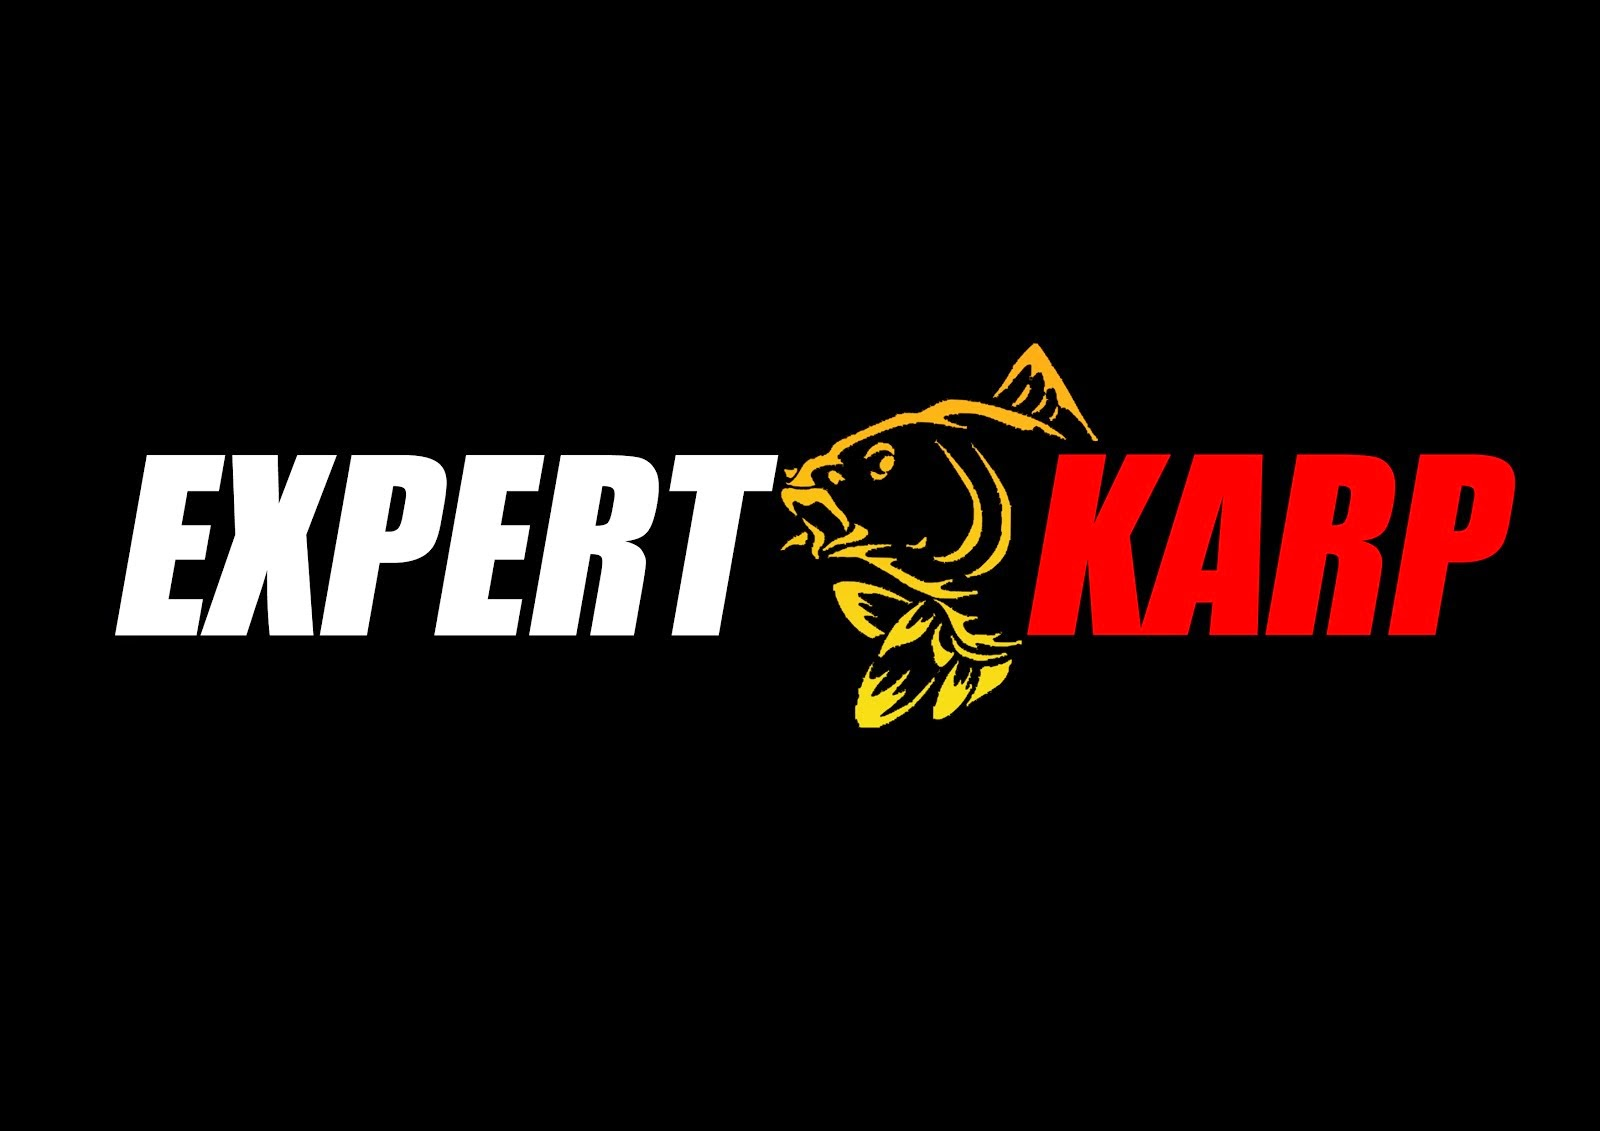 Portal.expert-karp.pl